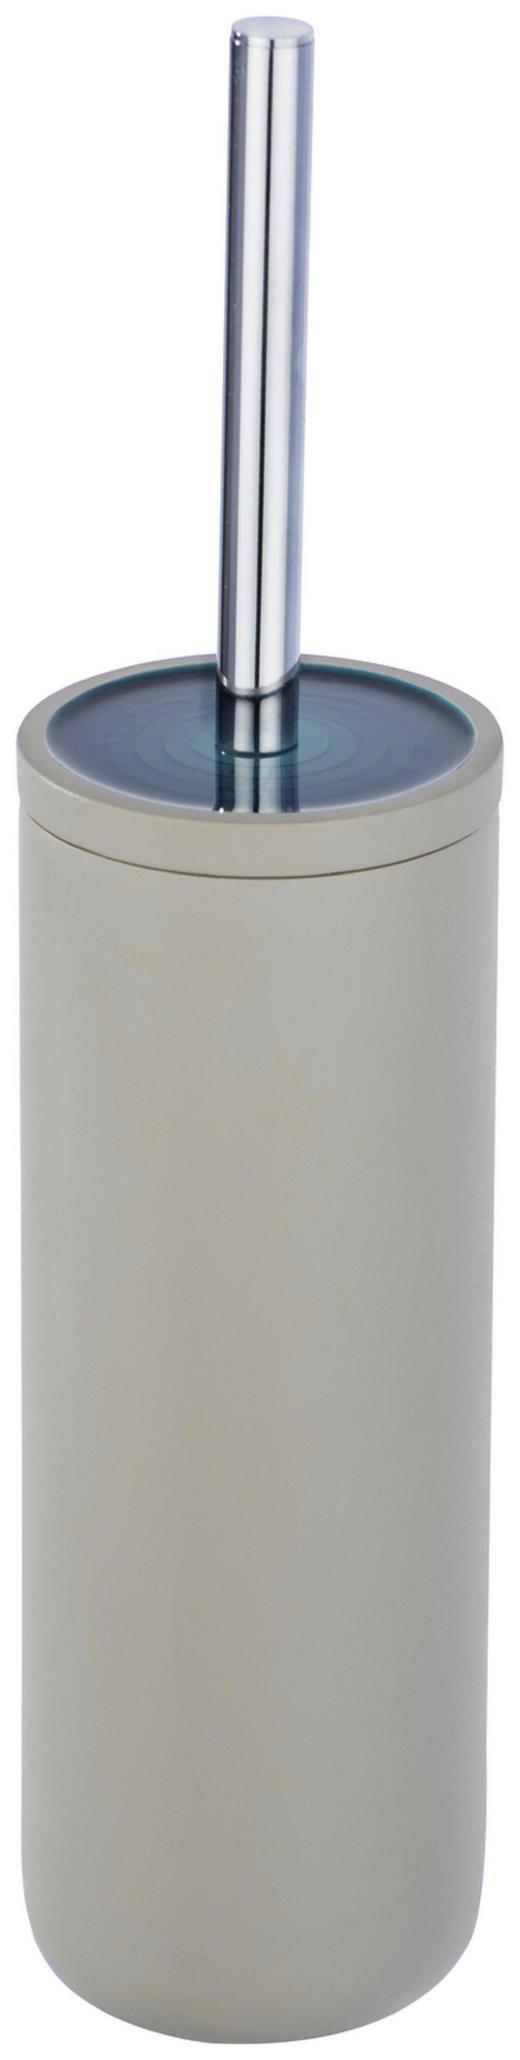 WC-BÜRSTENGARNITUR - Taupe/Chromfarben, MODERN, Kunststoff/Metall (9,5/39,5cm)